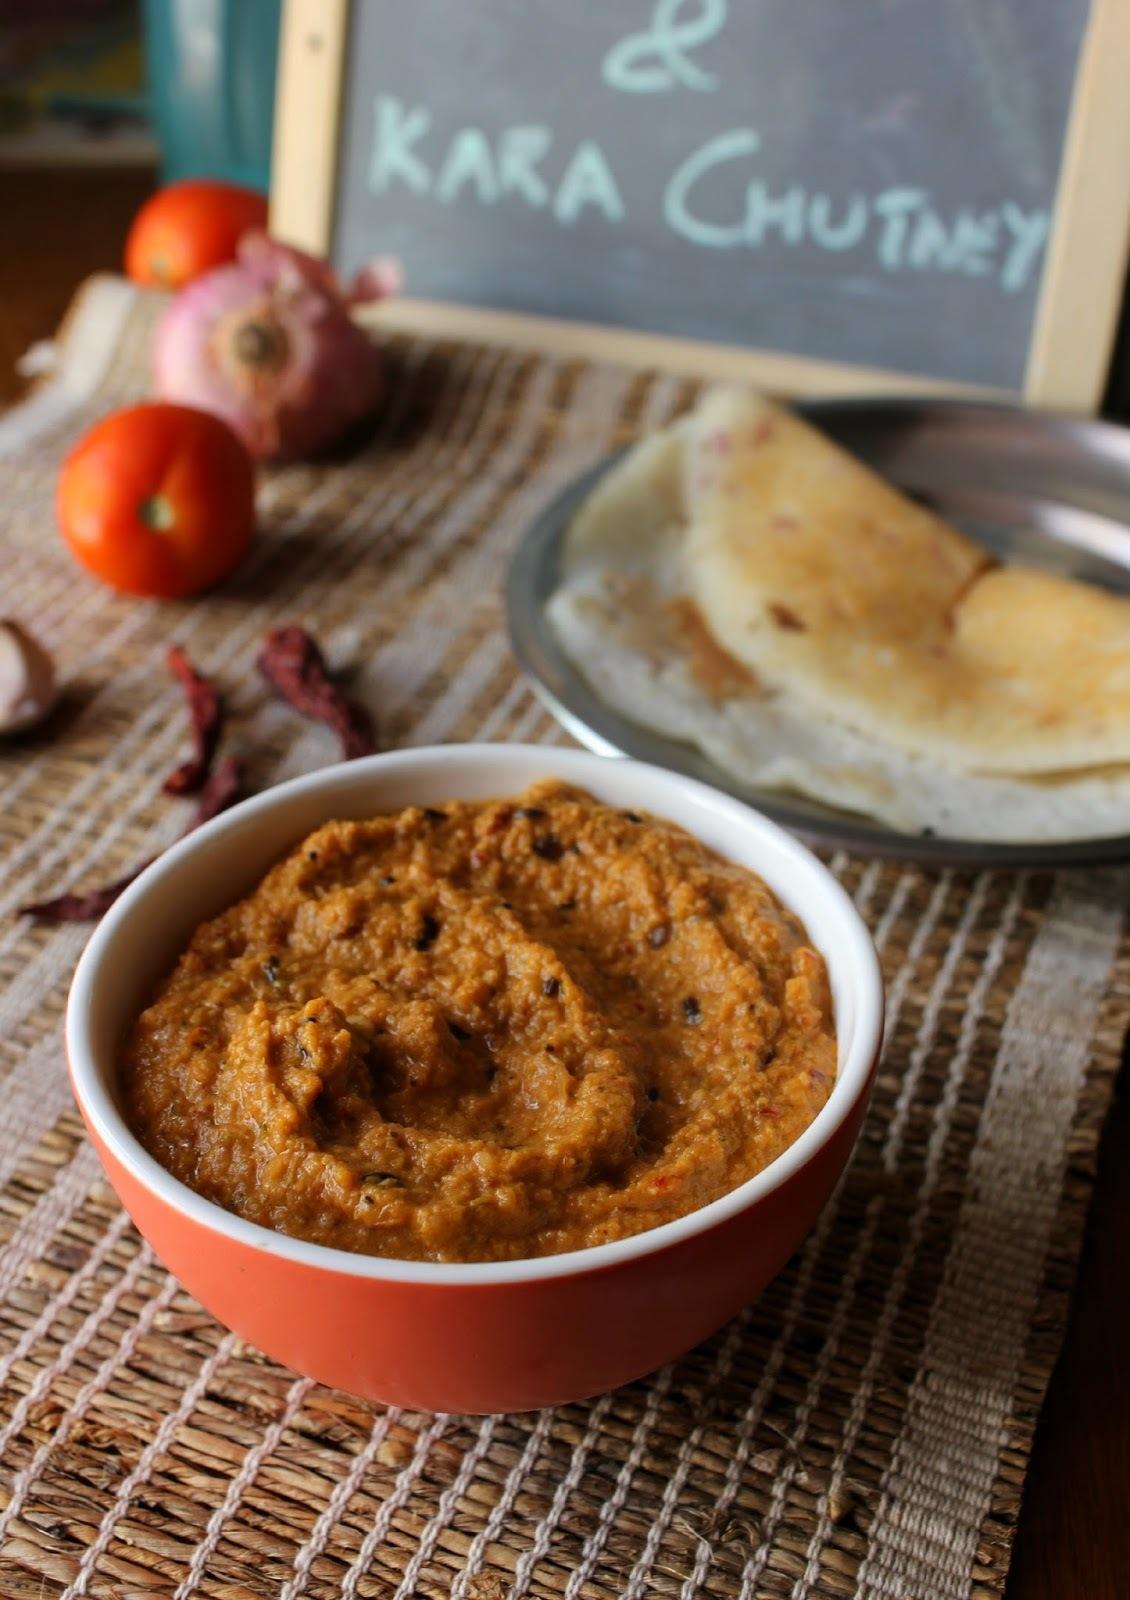 Kara Chutney | An Onion-Tomato coconut chutney